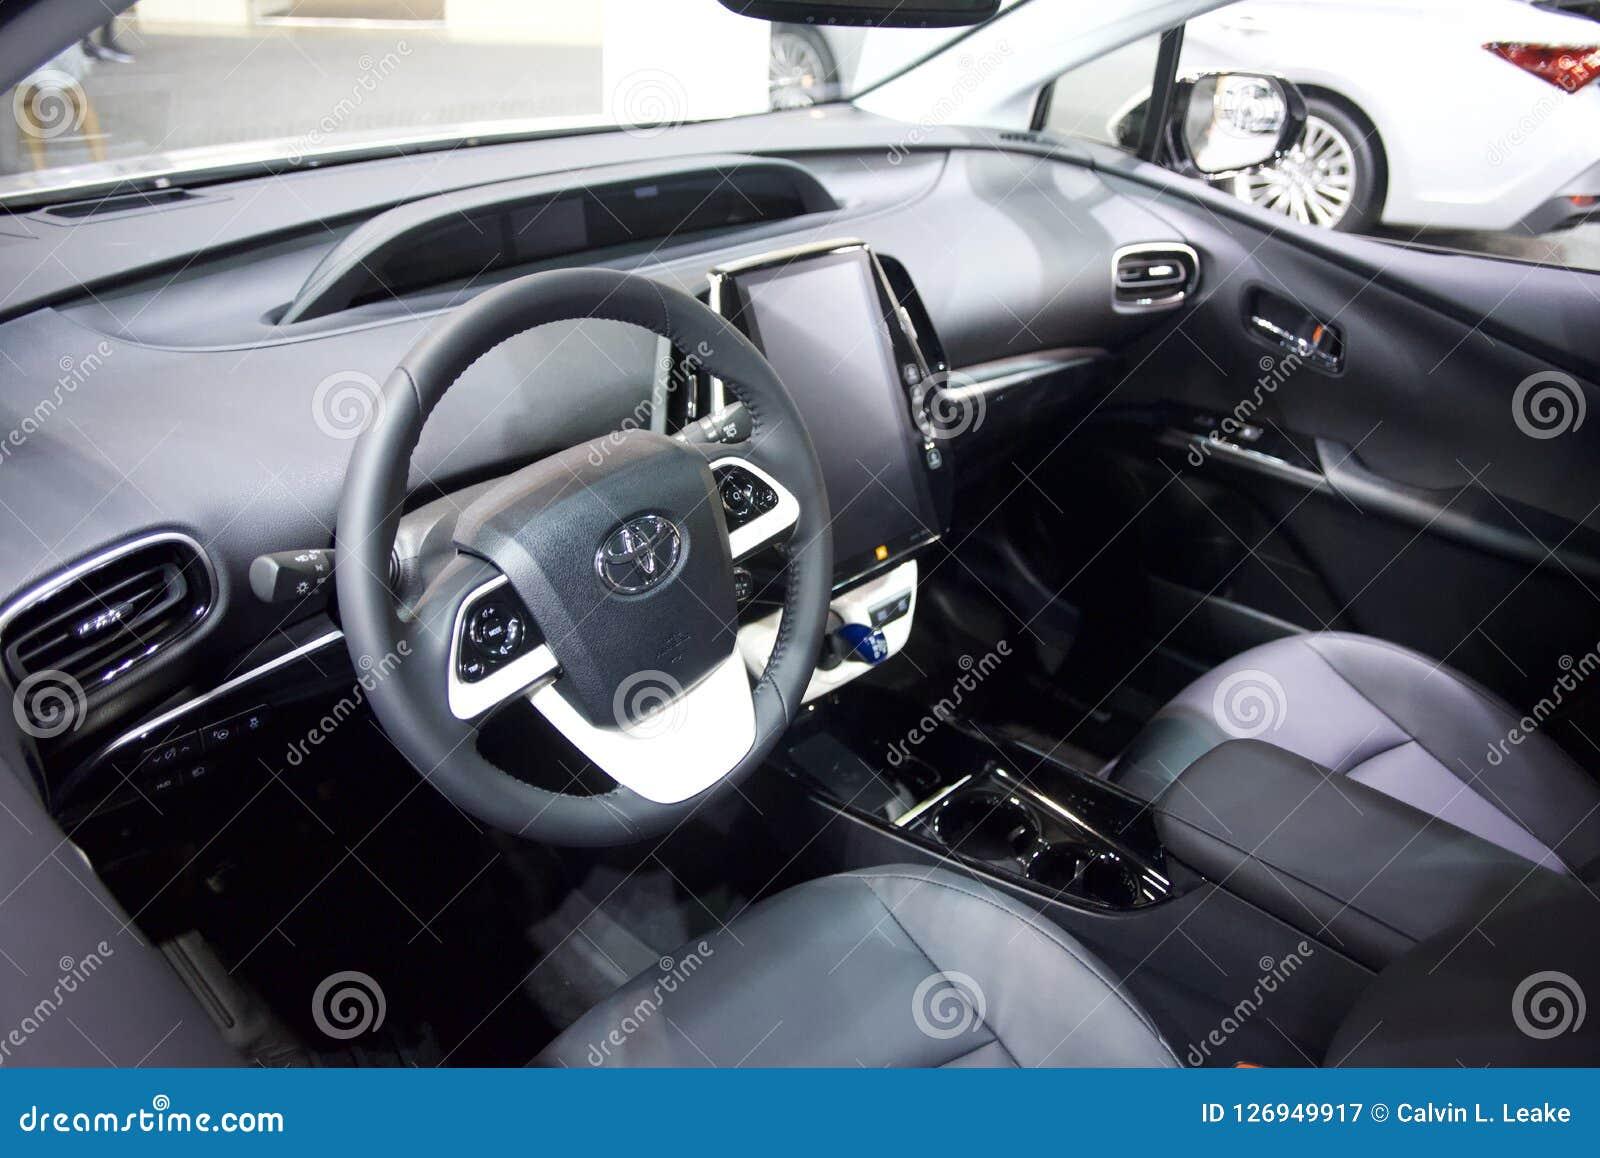 Toyota Motor Company Car Interior Editorial Photography Image Of